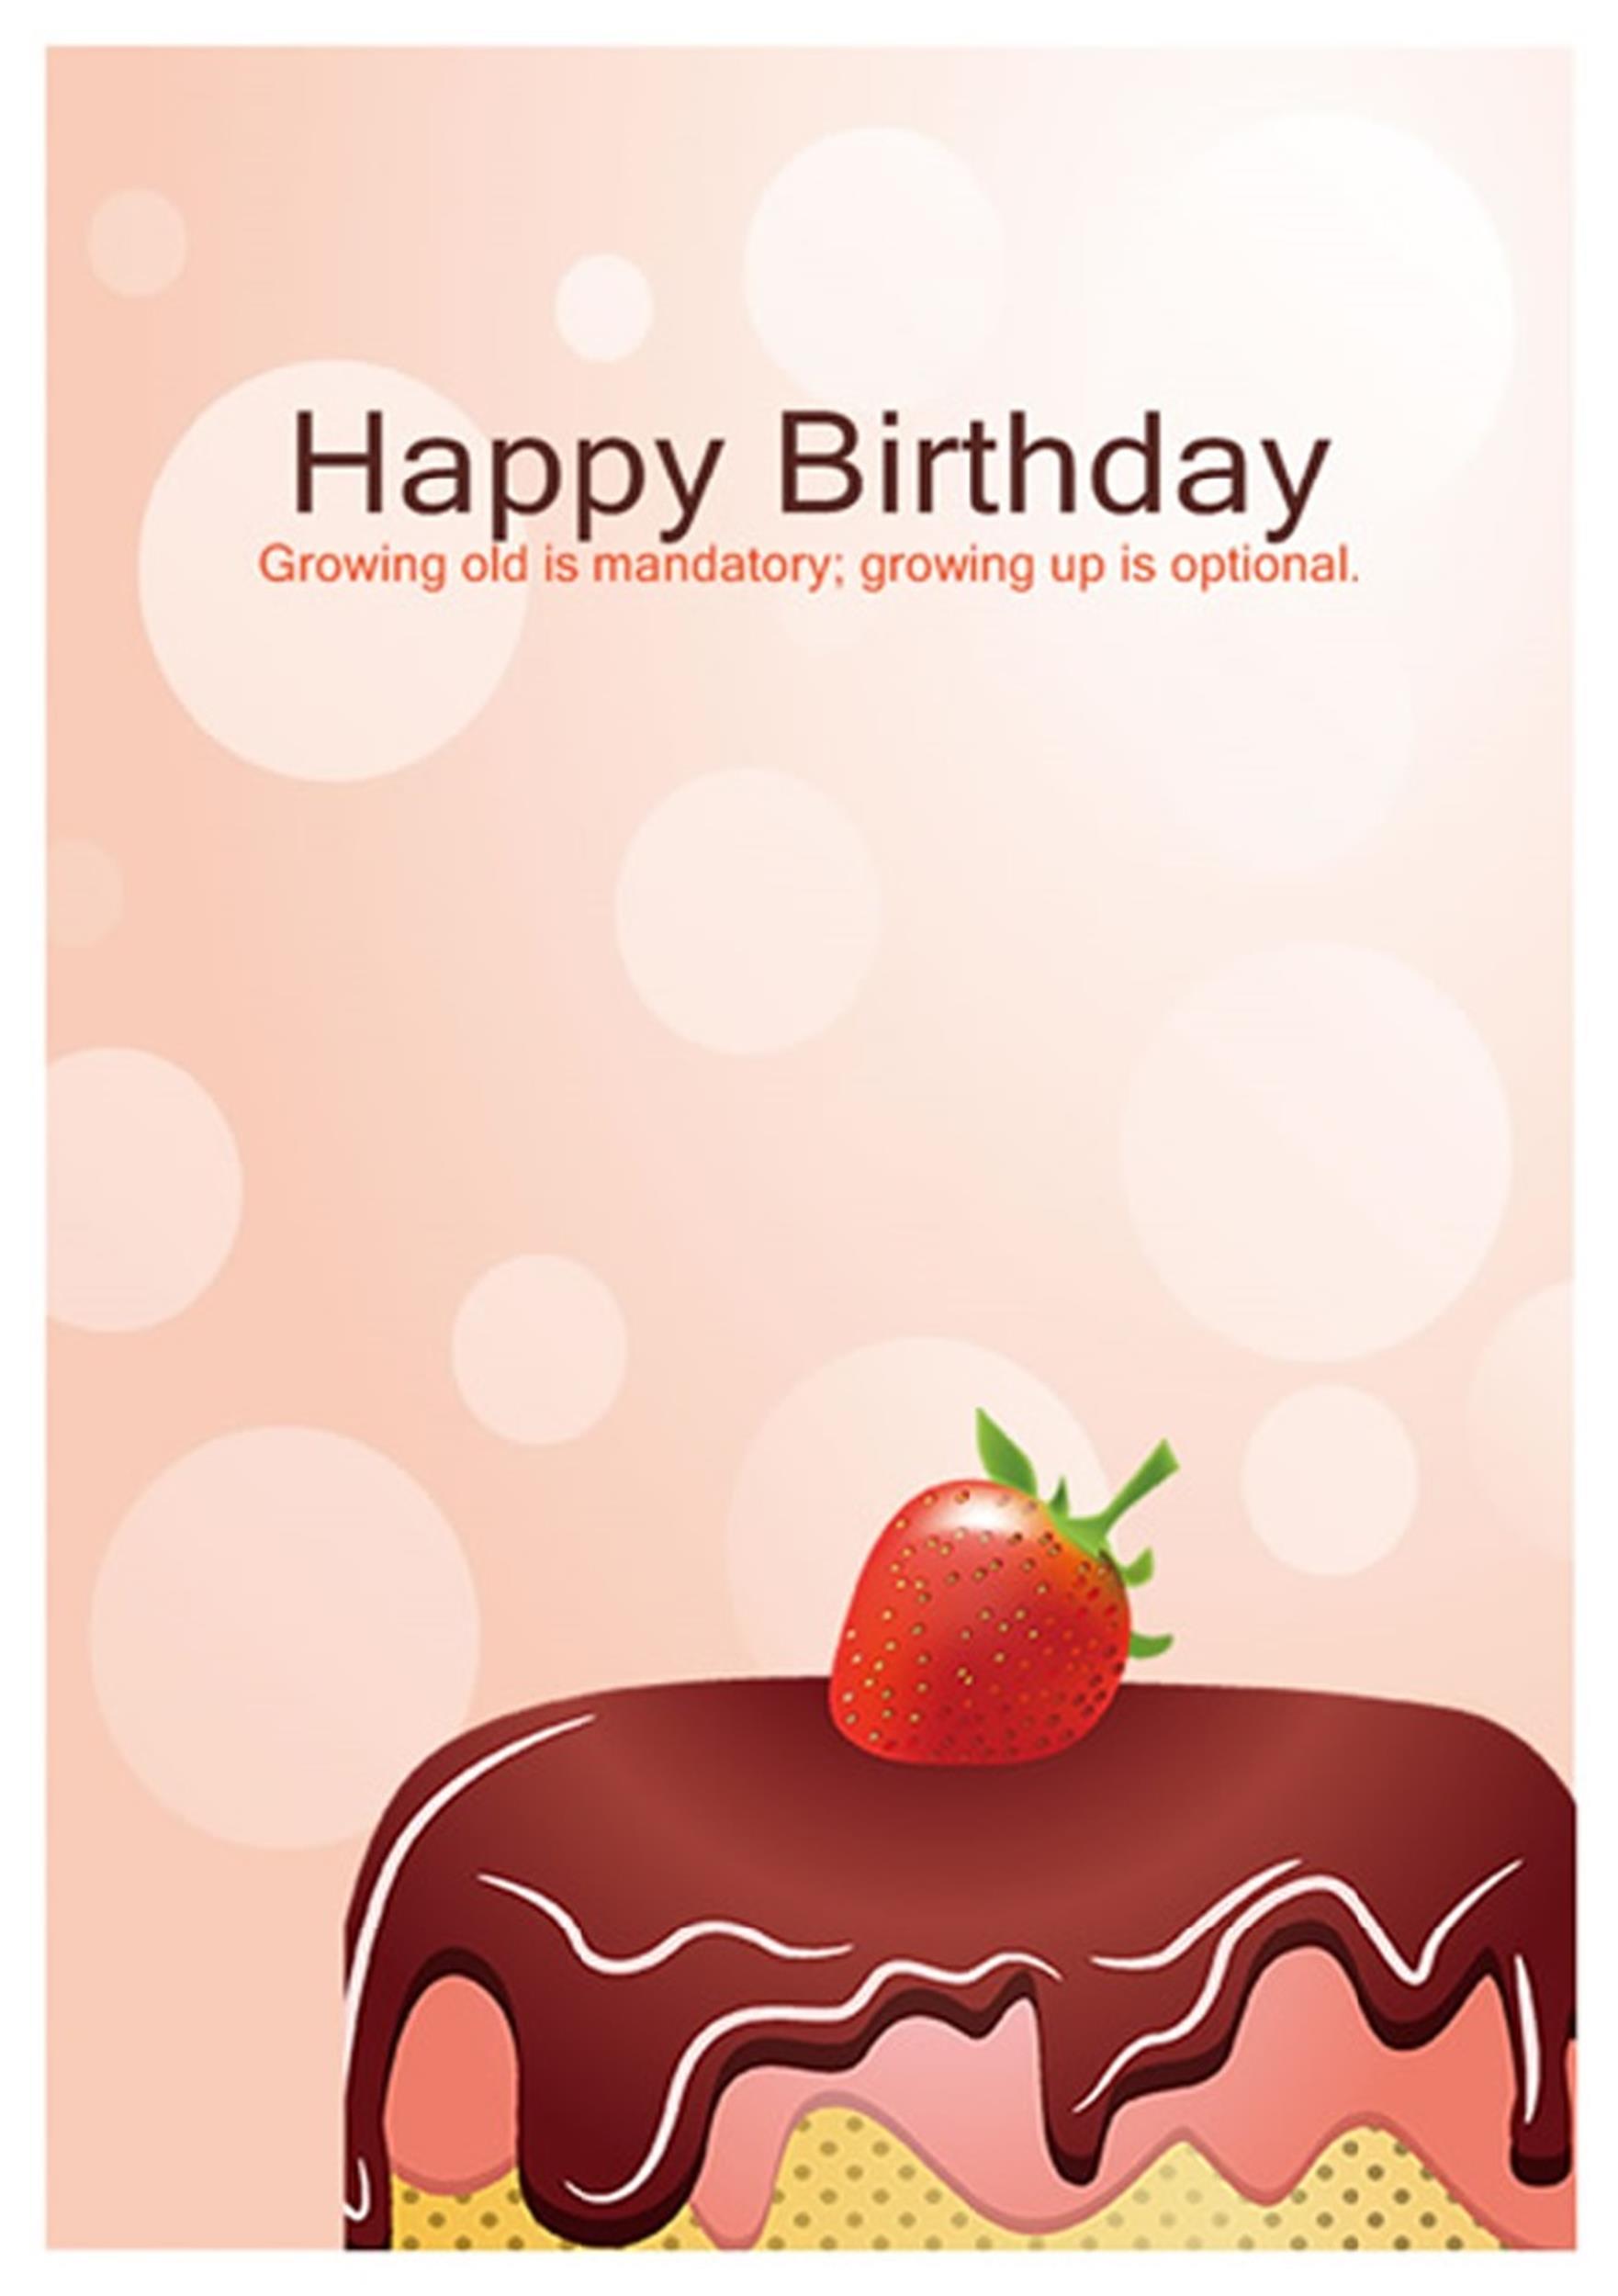 Free birthday card template 10